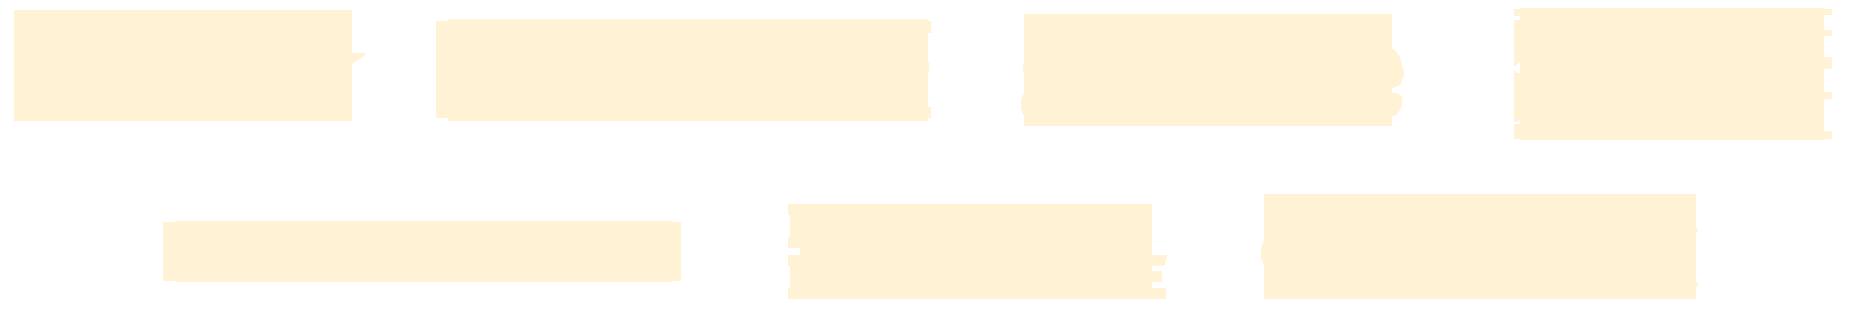 as-seen-logos.png